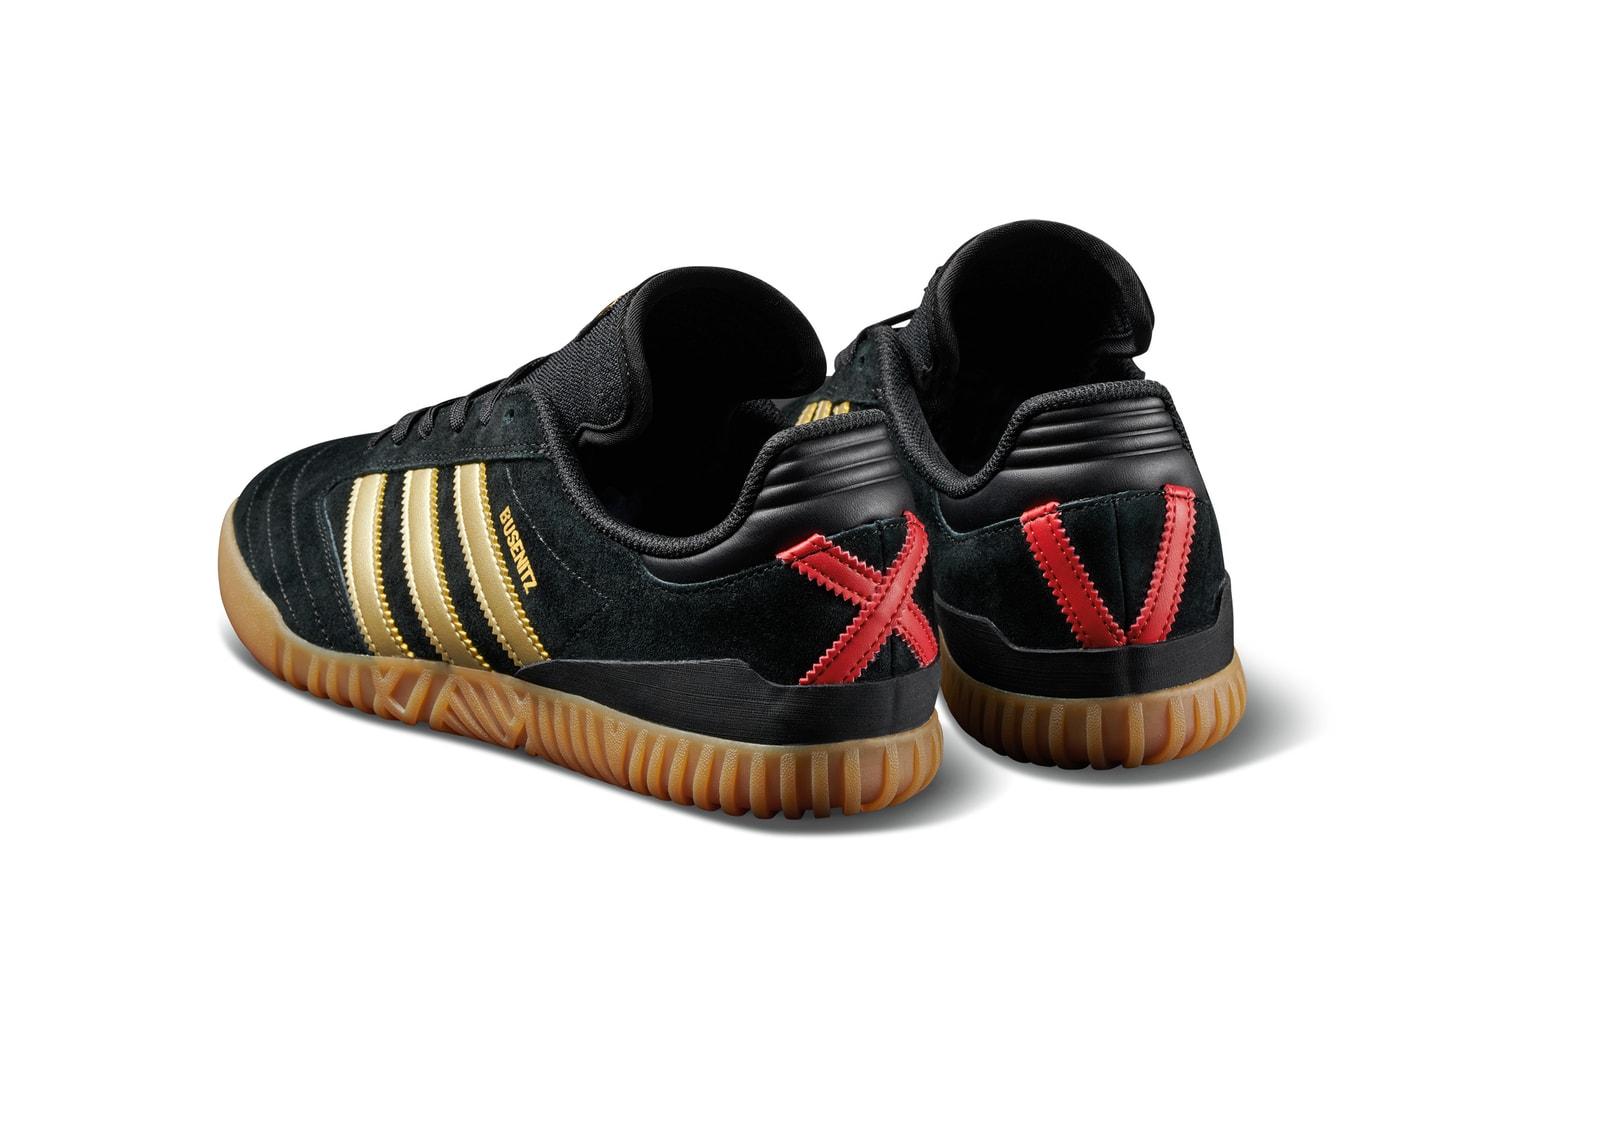 Dennis Busenitz's Adidas Indoor Super 15th Anniversary Shoe Drops Tomorrow